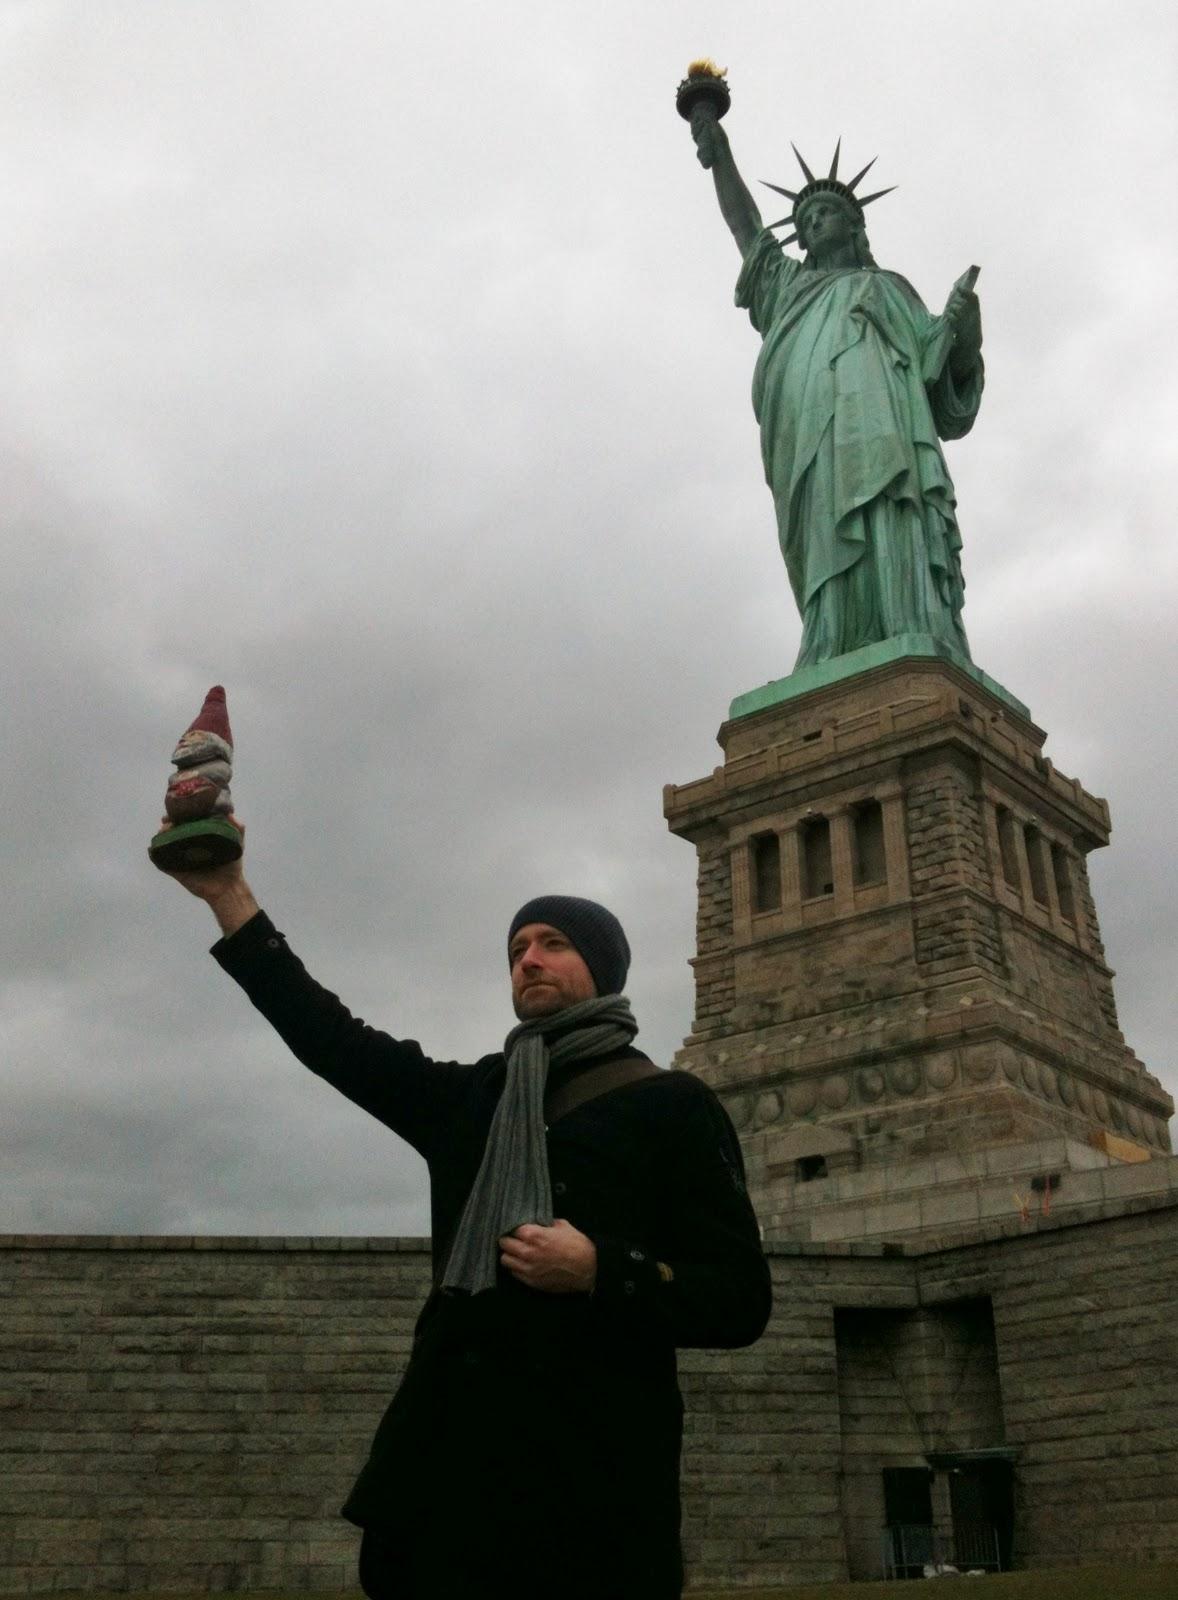 http://3.bp.blogspot.com/-5ibEPCio2KM/T2ZkGb9T8eI/AAAAAAAAIH0/J3ZDAqvNc-s/s1600/Montmorency+Montgomeryblog+liberty+gnome.JPG